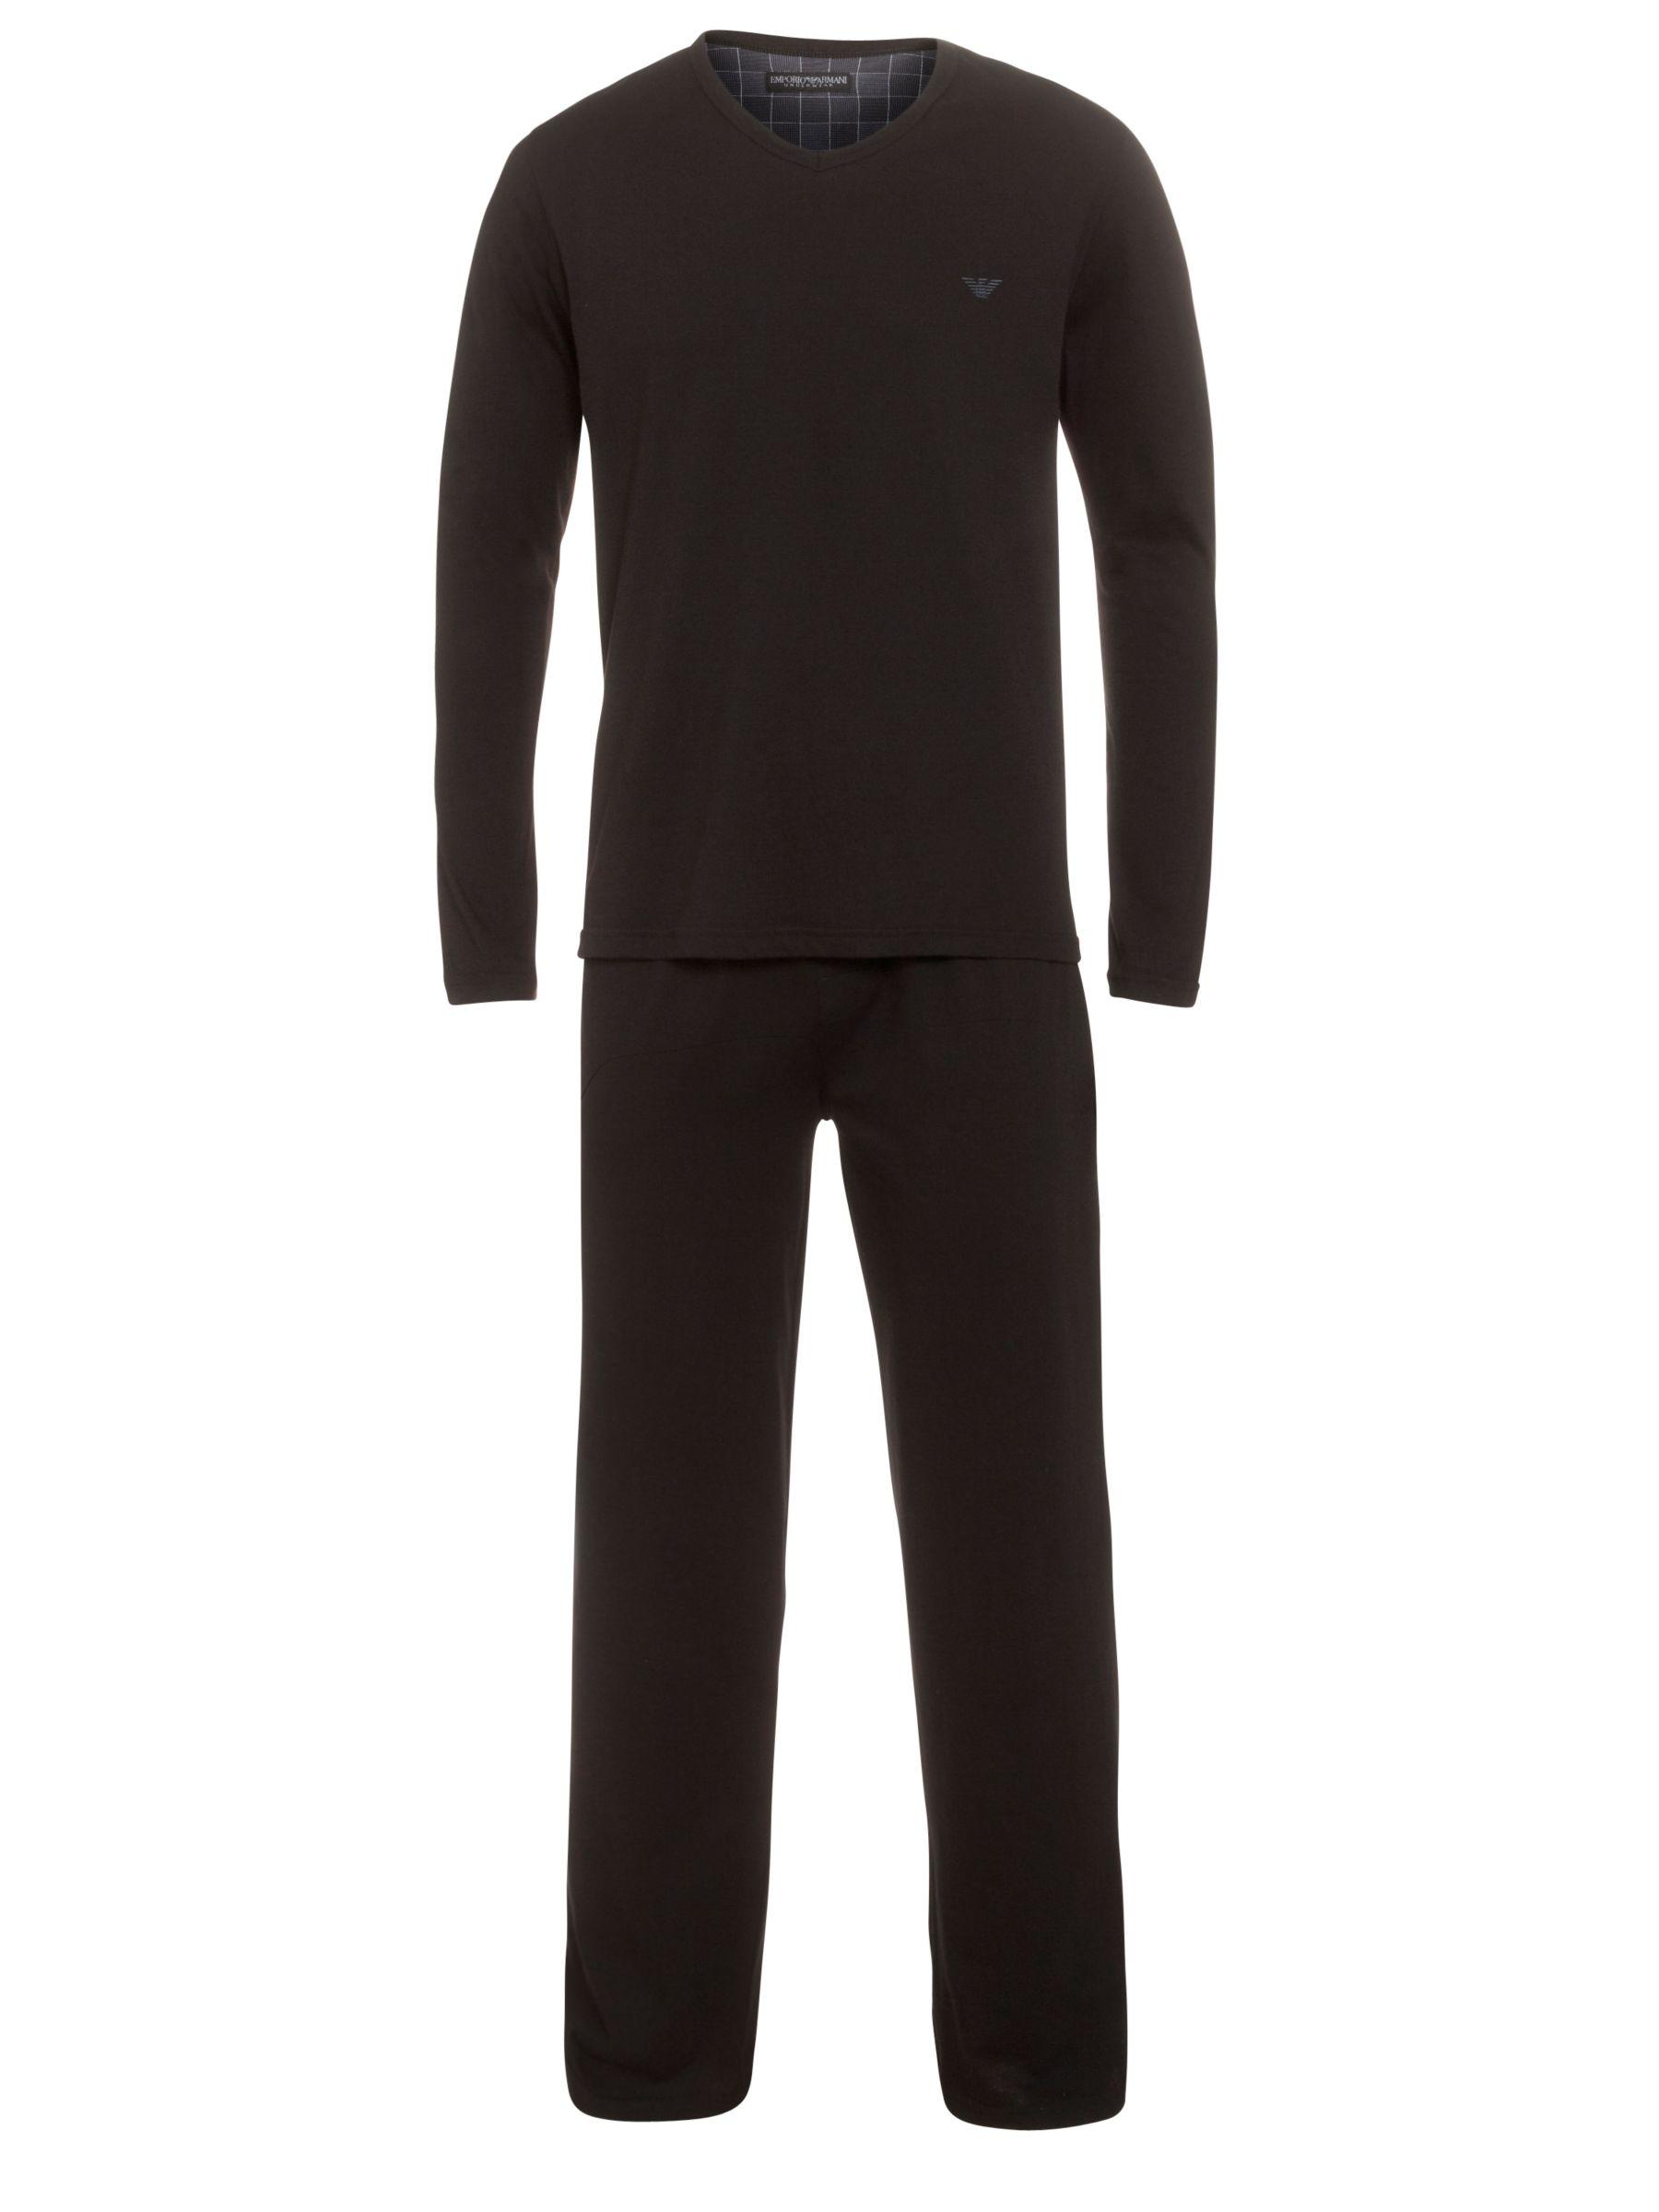 Emporio Armani Cotton Pyjamas Set, Black